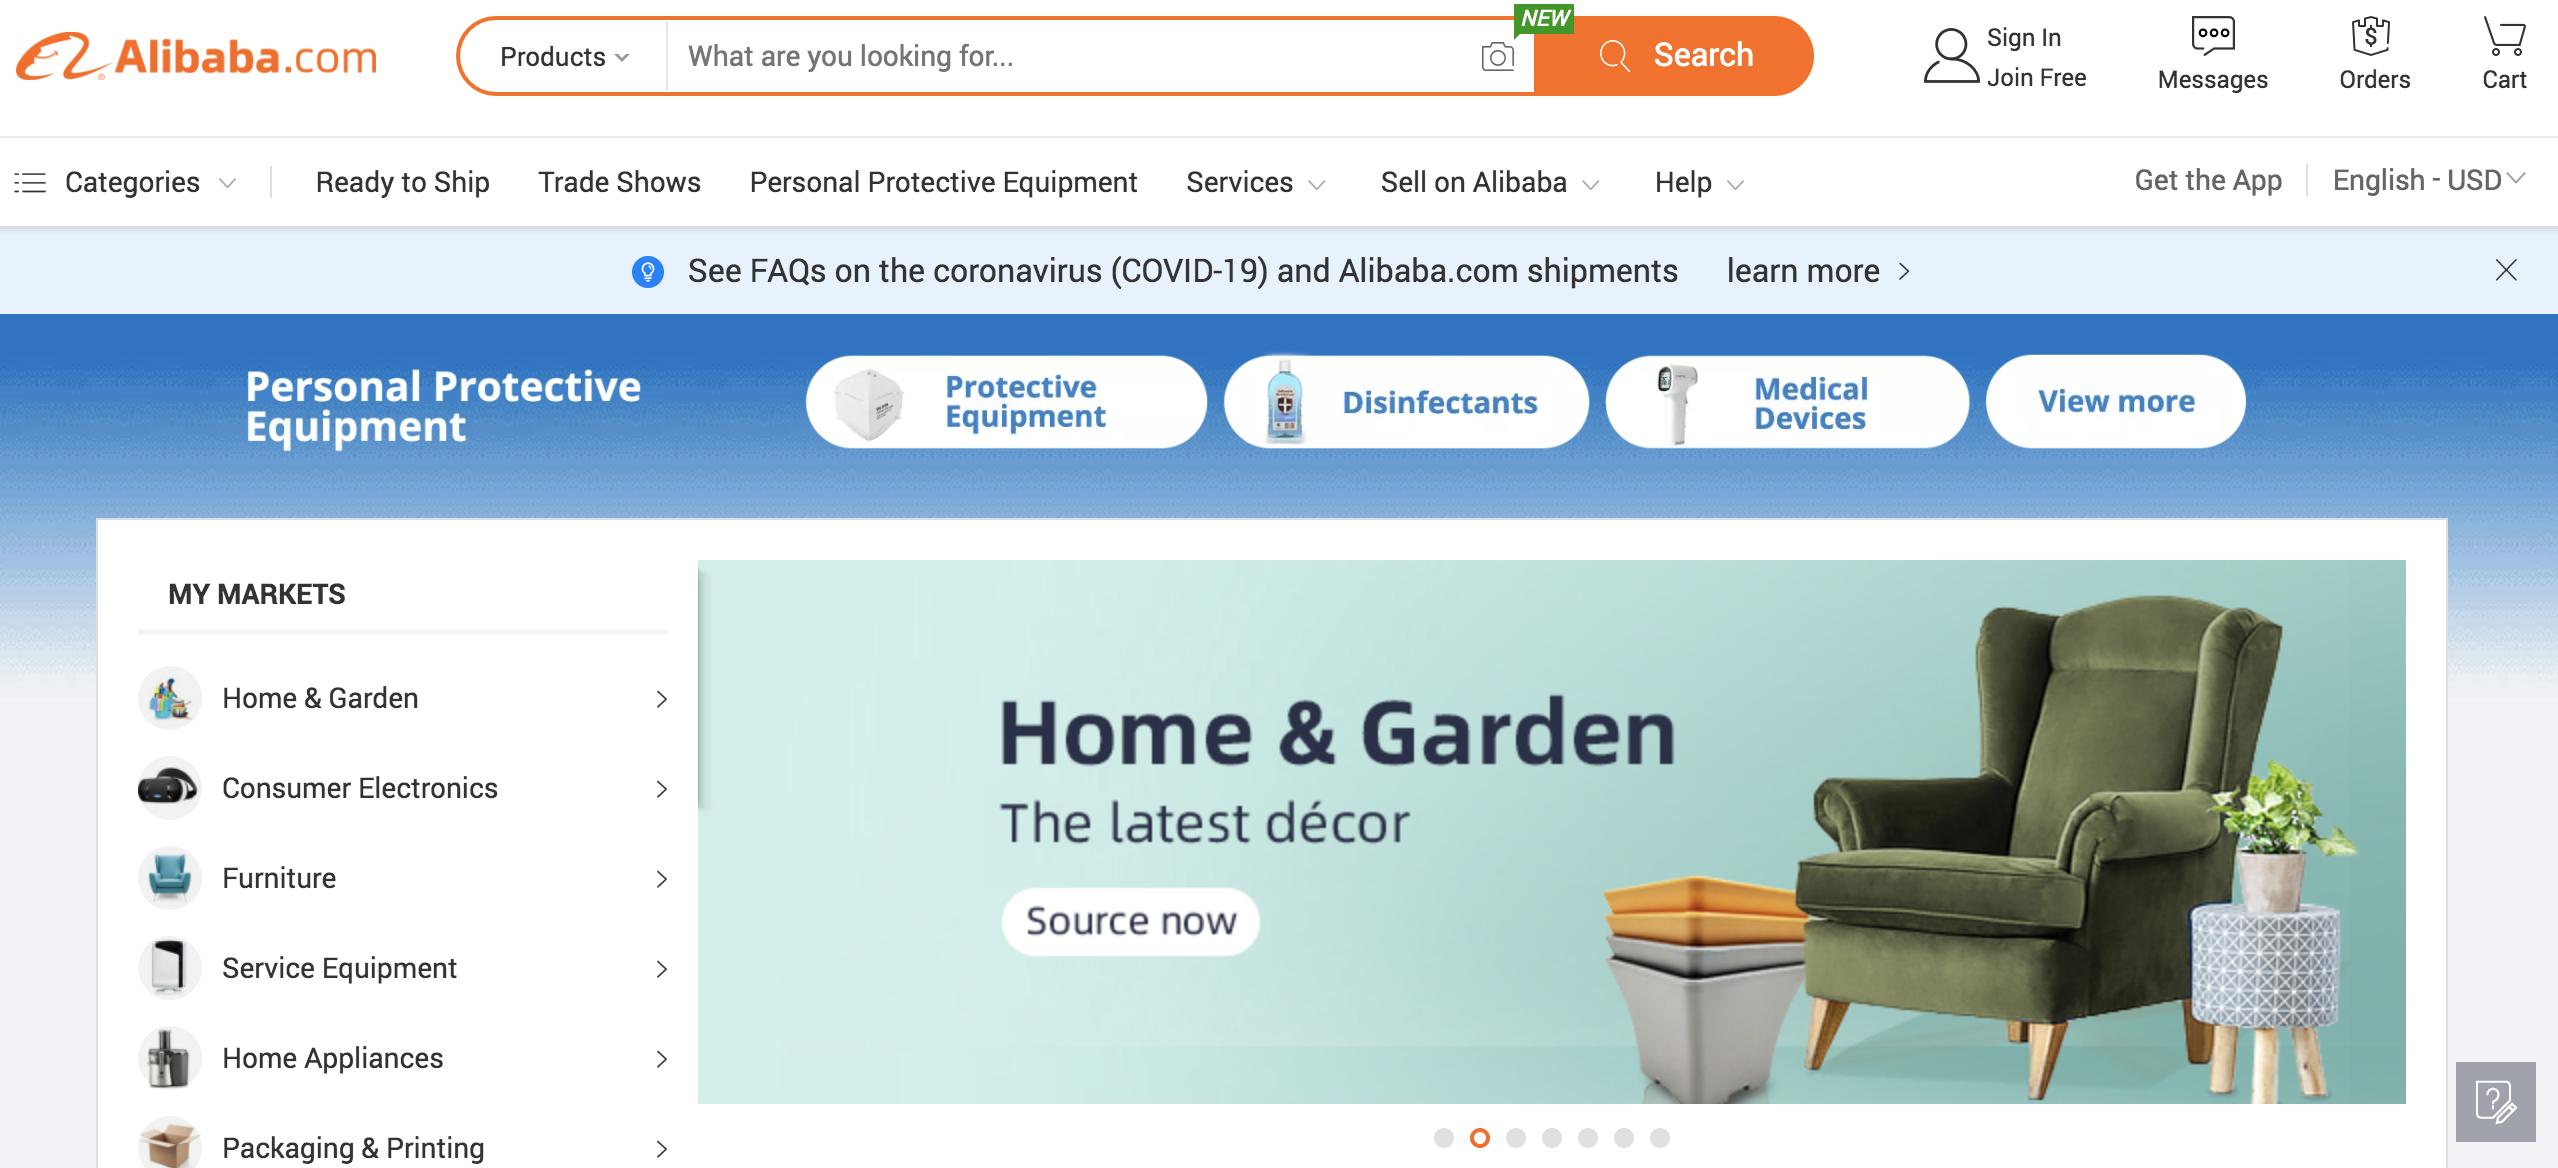 alibaba website